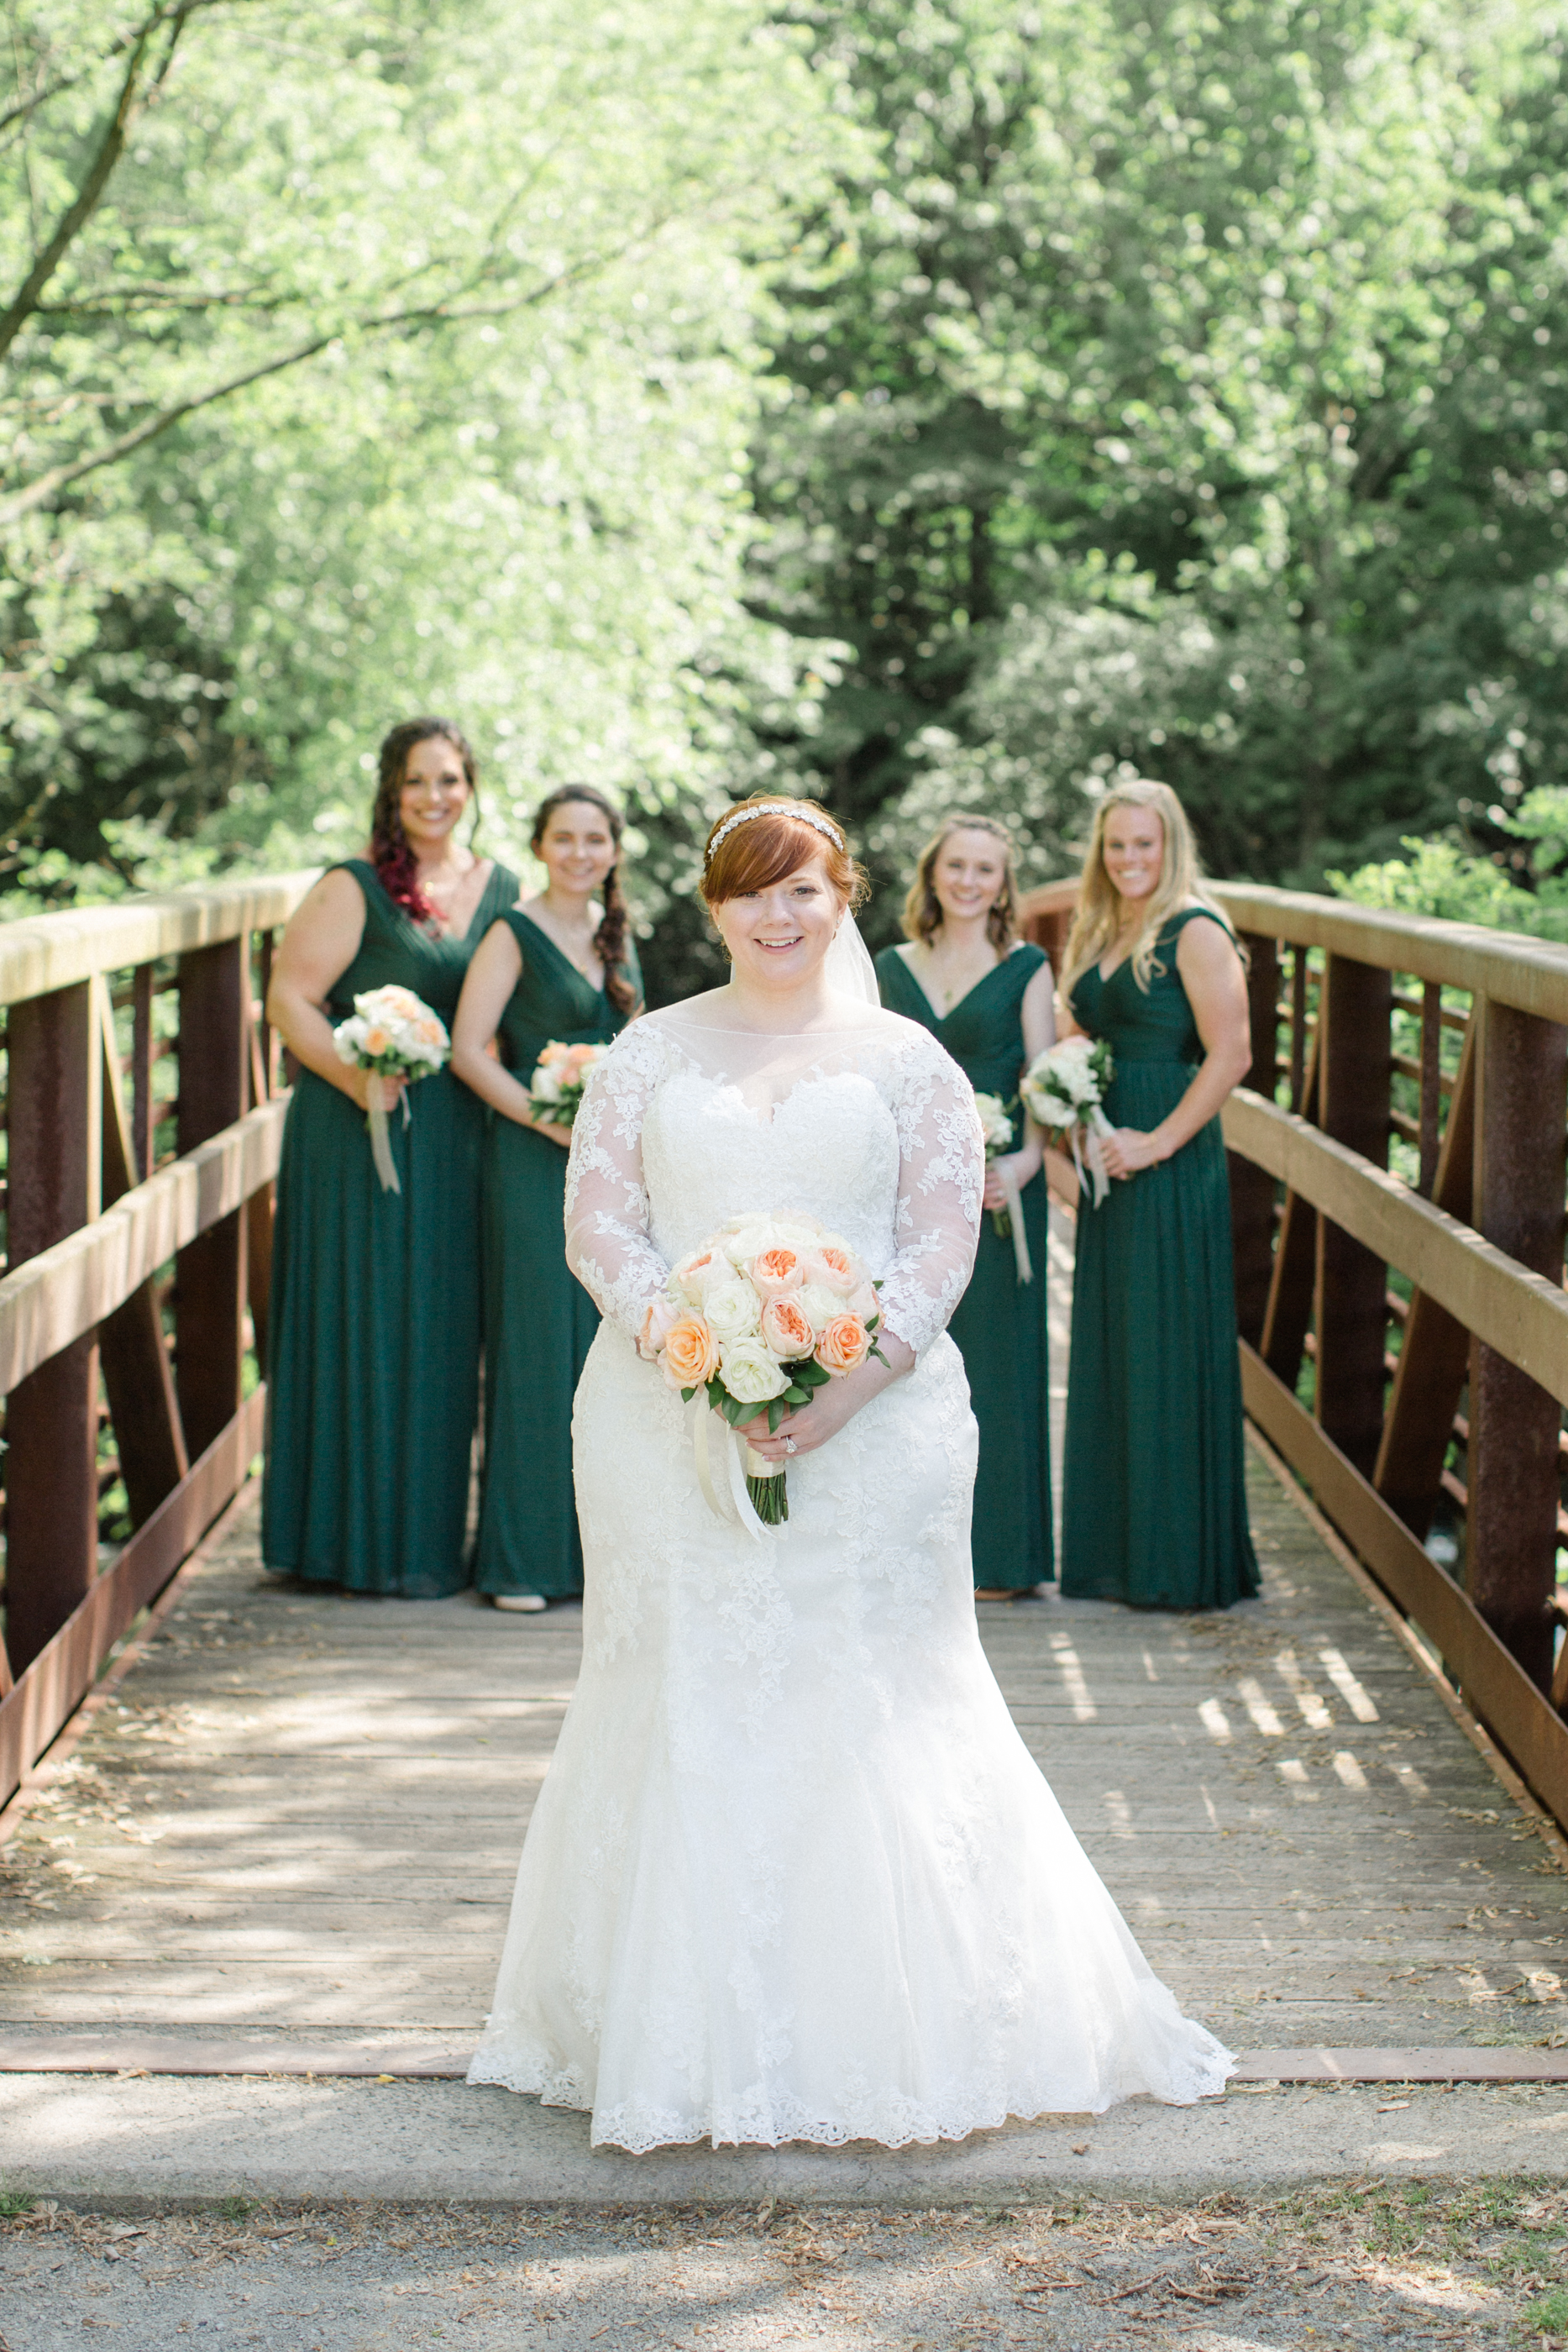 Fiorellis Wedding Photos_JDP-81.jpg